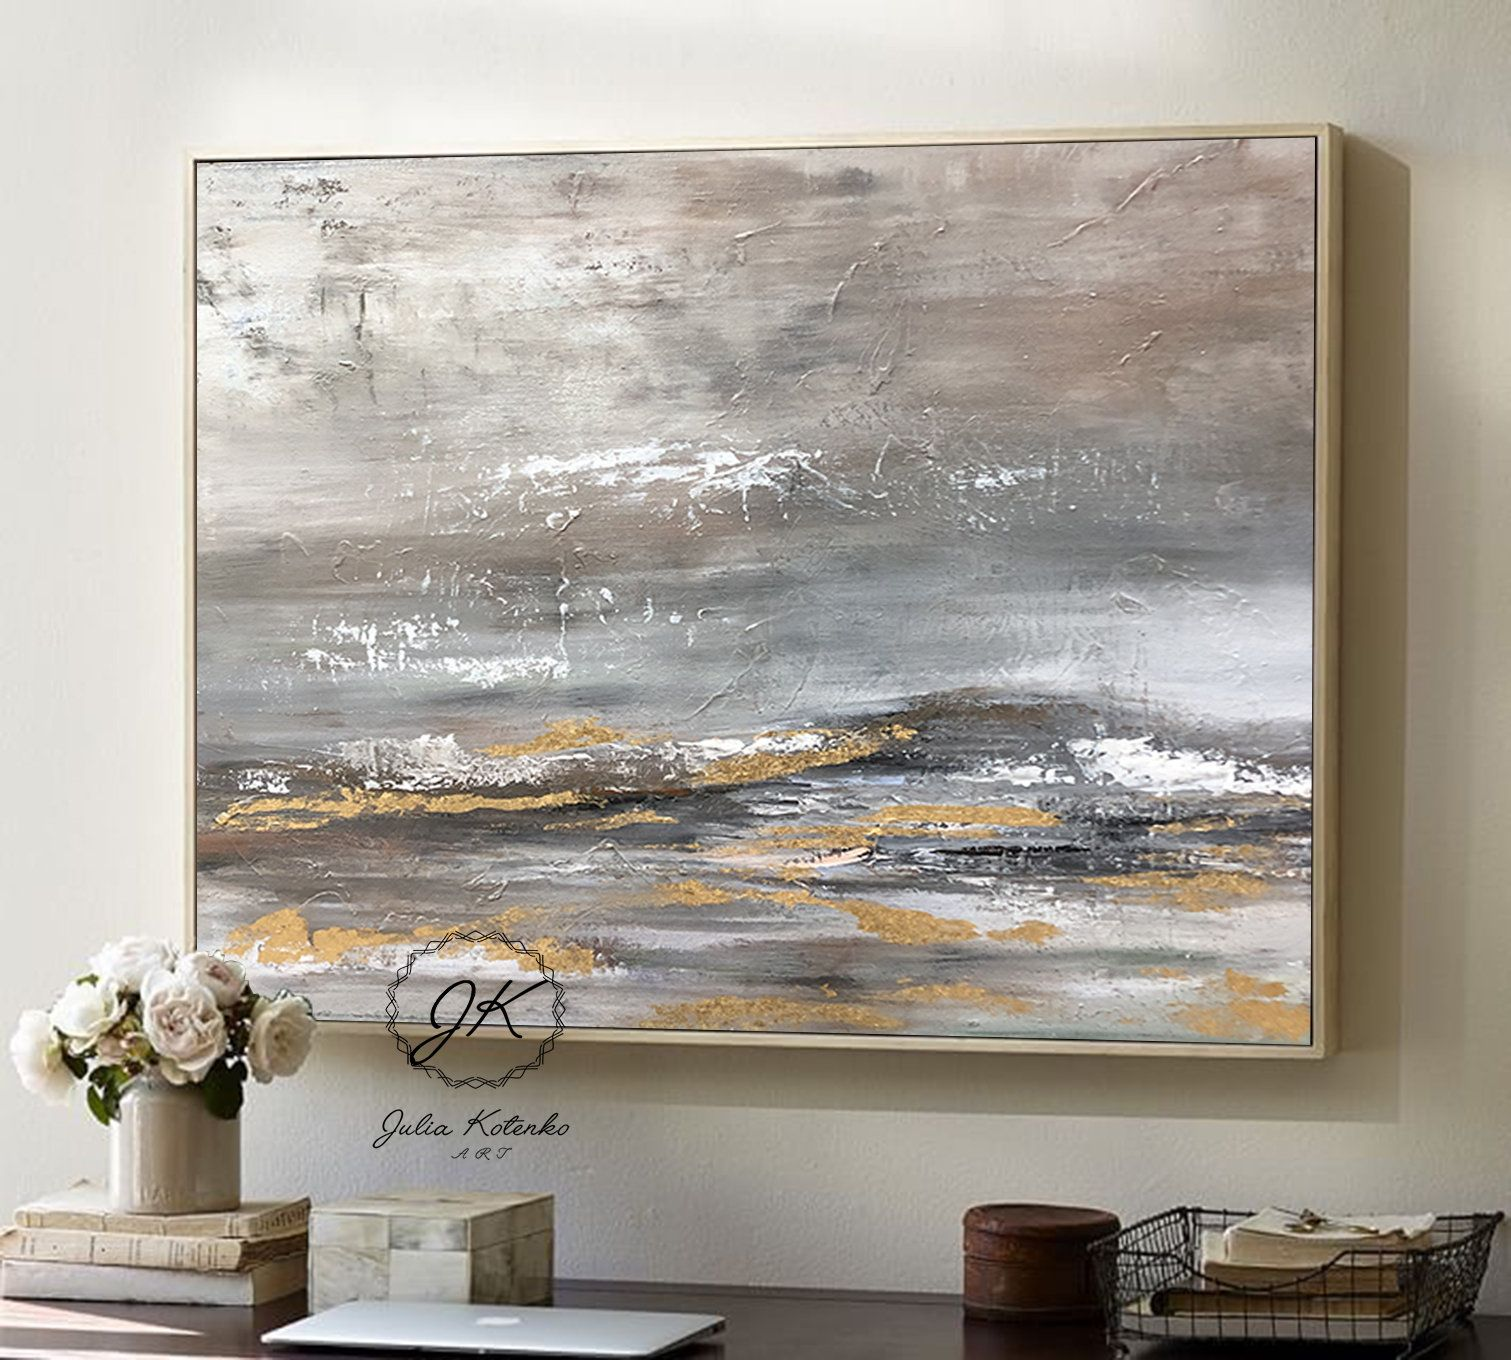 Original Floral Land Oil Painting,Decor Landscape,Acrylic Painting Large,Large Wall Art Abstract Painting,Extra Large Wall Art,Textured Art